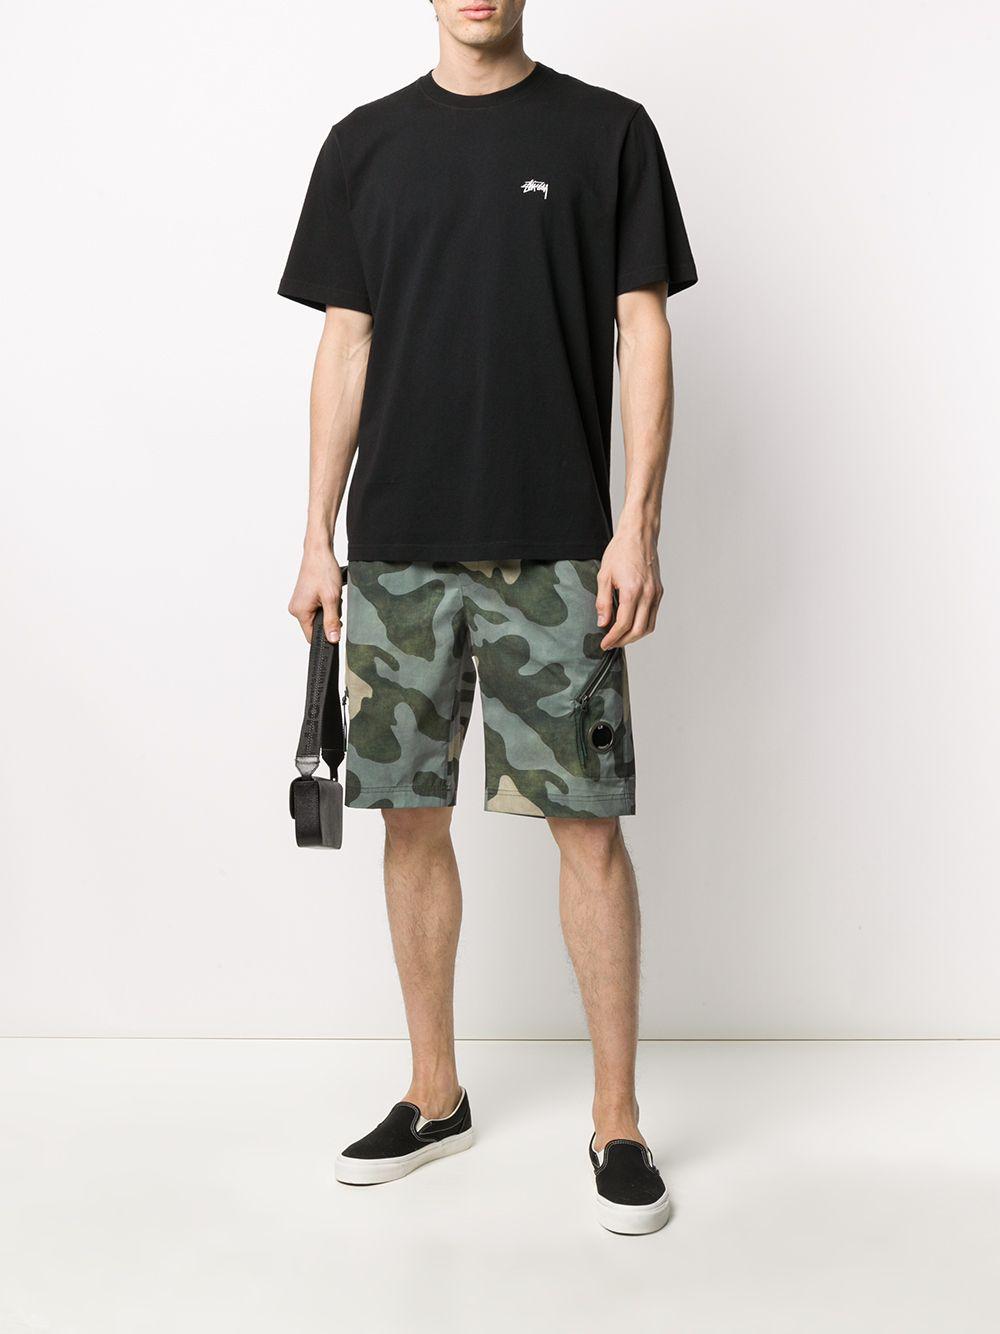 T-SHIRT CON LOGO STUSSY | T-shirt | 1140194BLACK